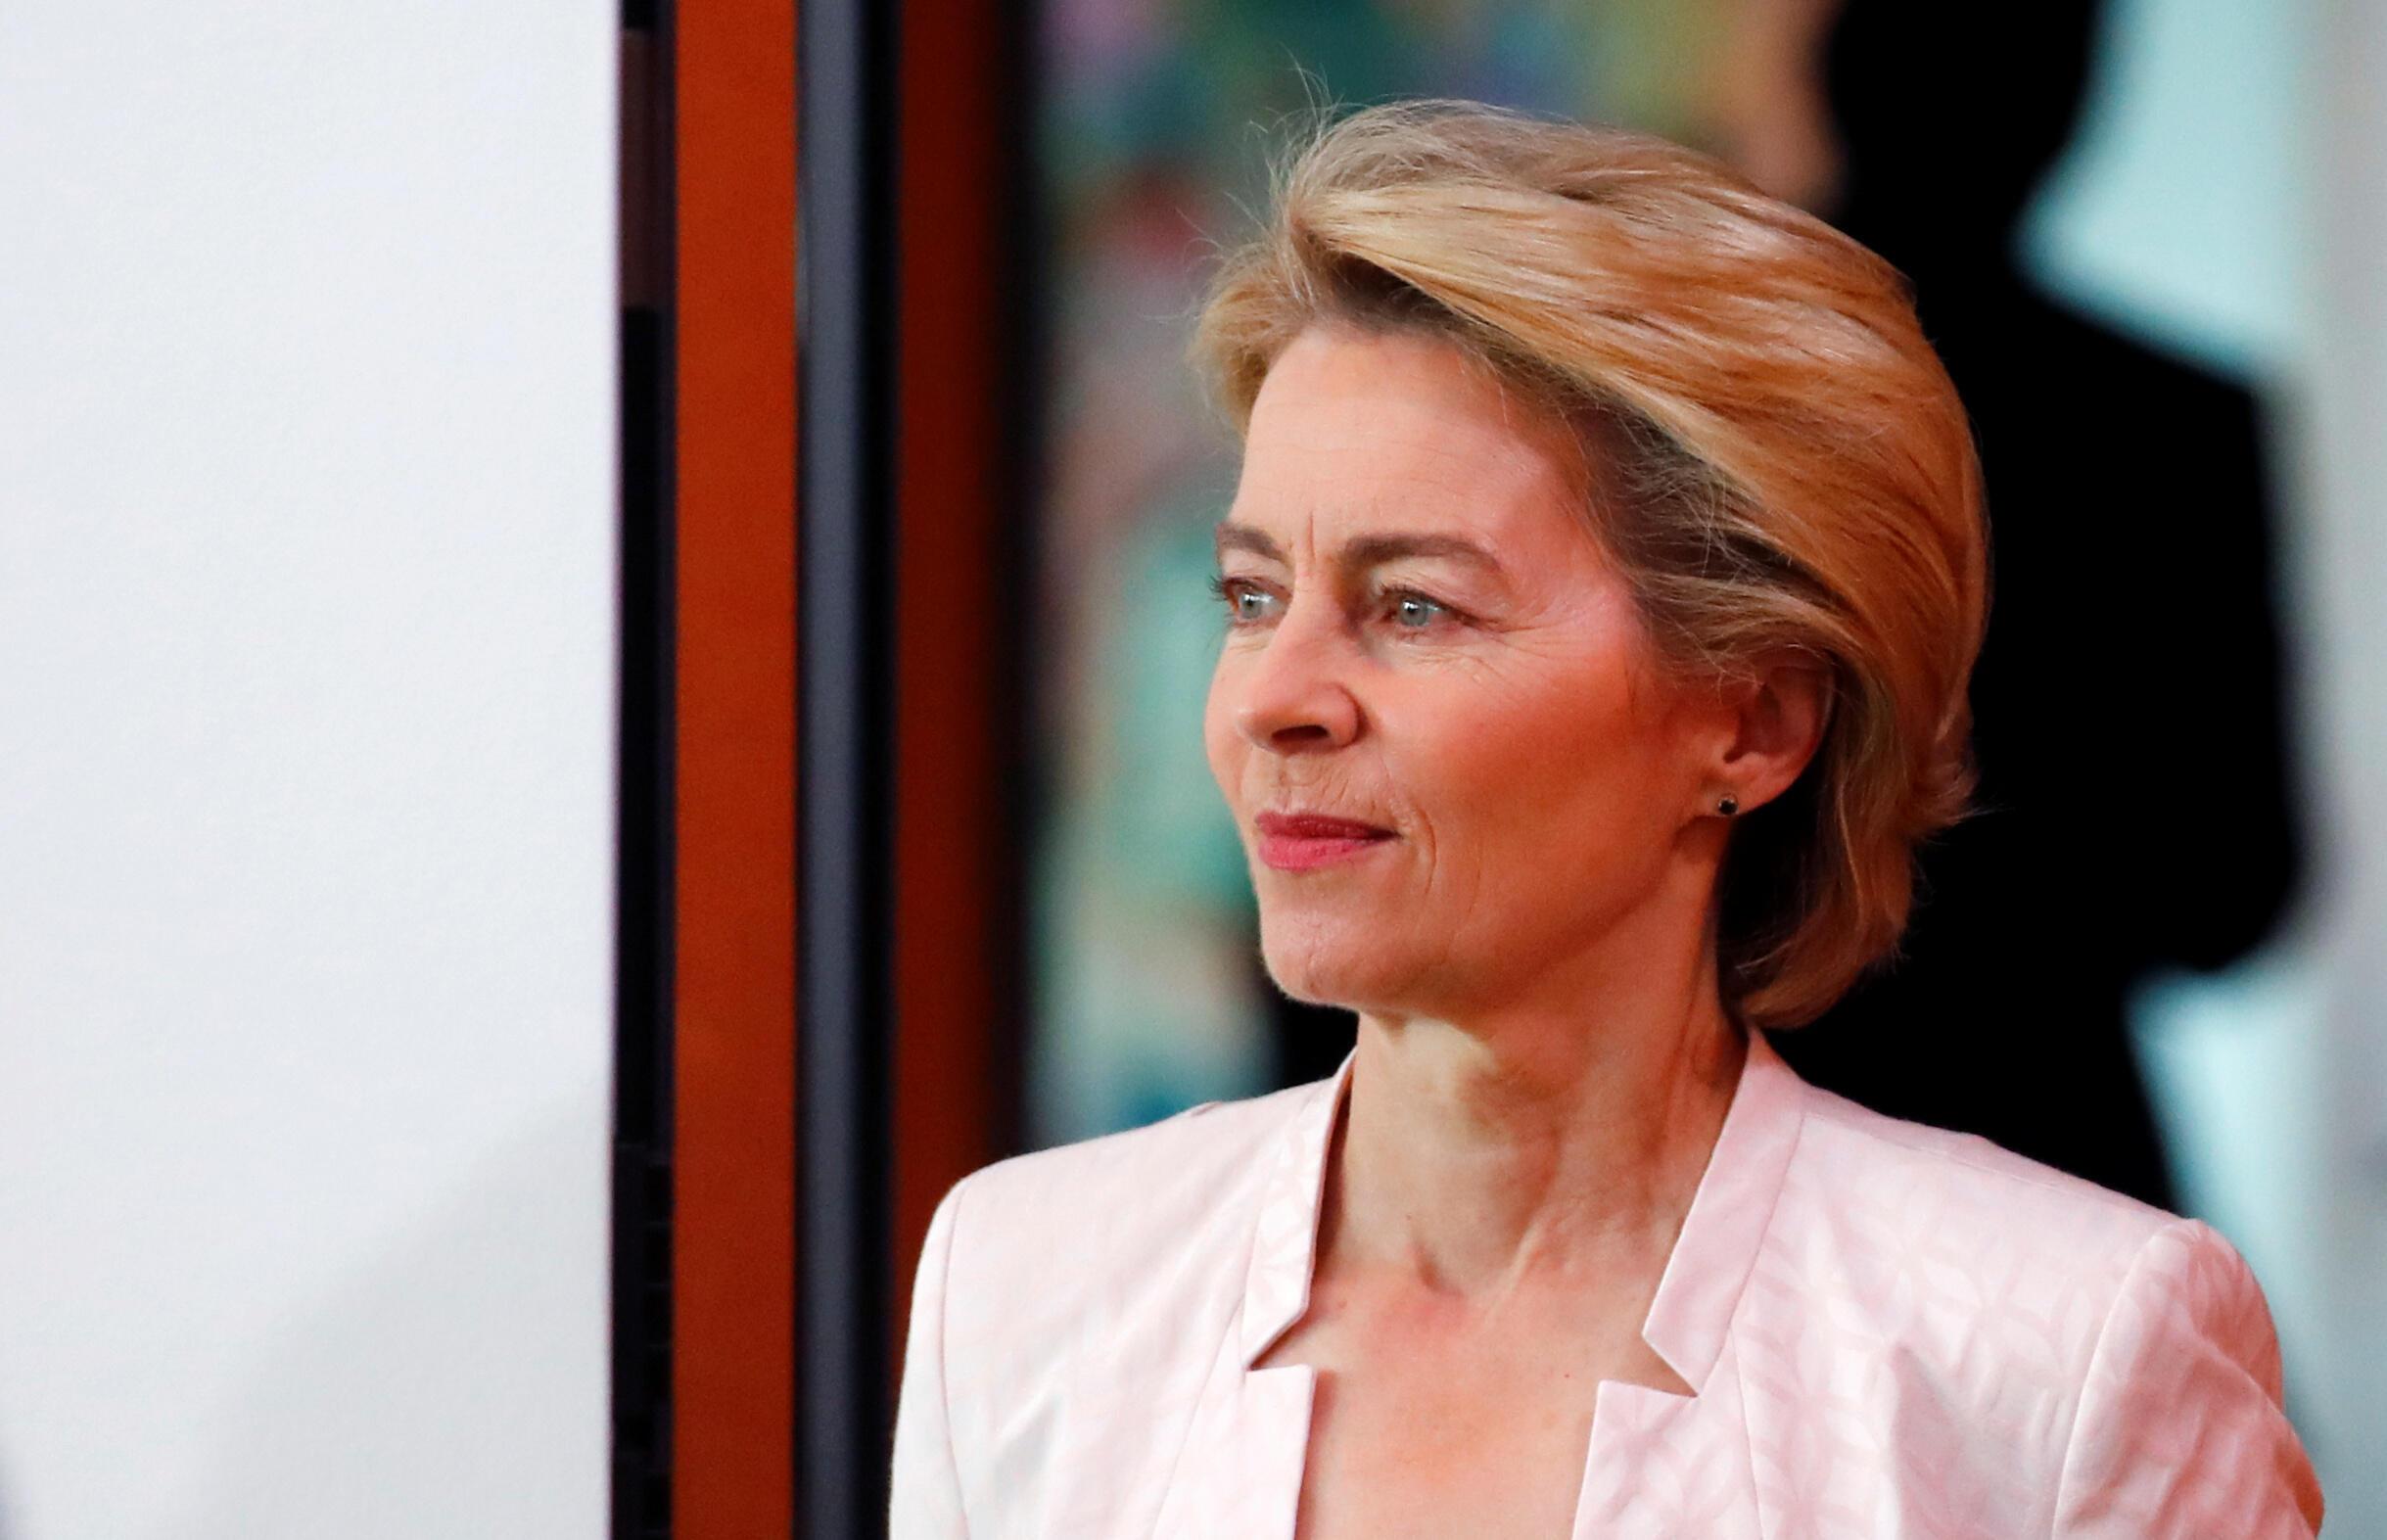 Ursula von der Leyen, ministra de defesa alemã, espera aval dos eurodeputados para presidir a Comissão Europeia sion President, attends the weekly cabinet meeting at the Chancellery in Berlin, Germany, July 3, 2019.